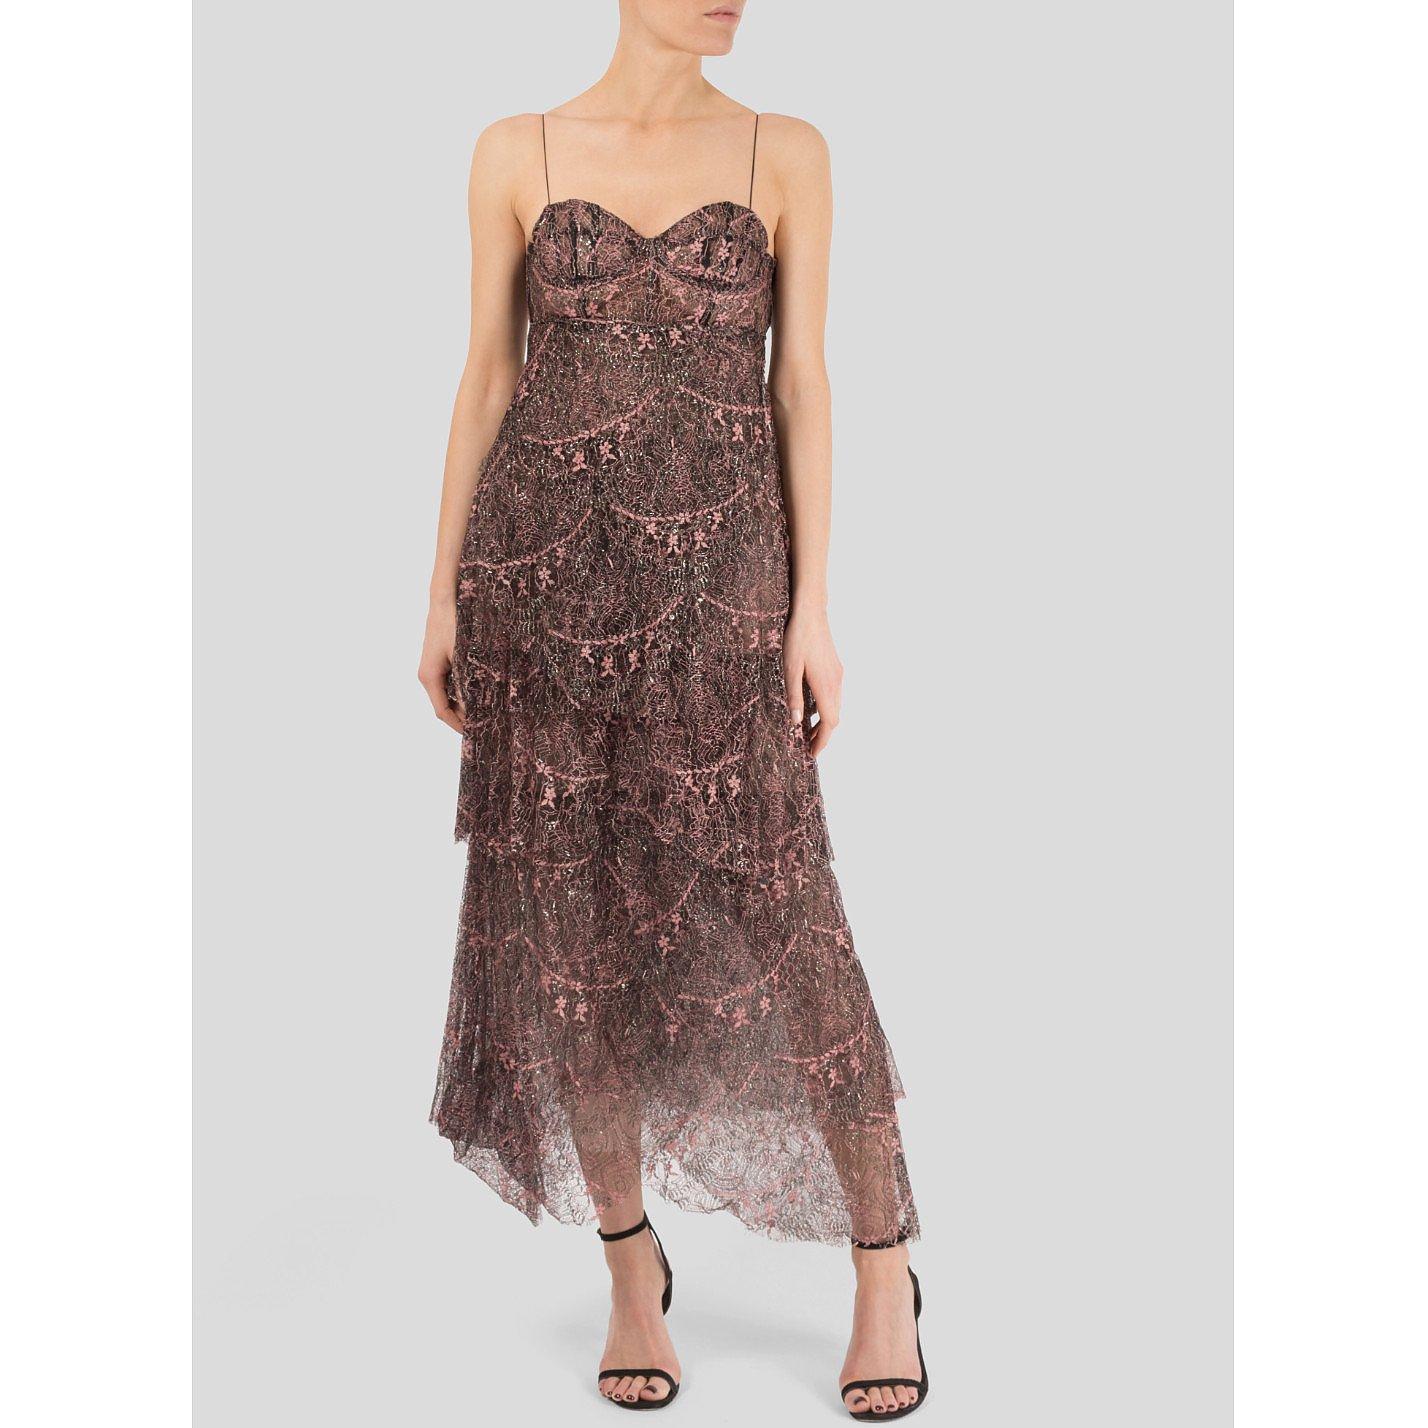 Sharon Wauchob Lace Bustier Dress